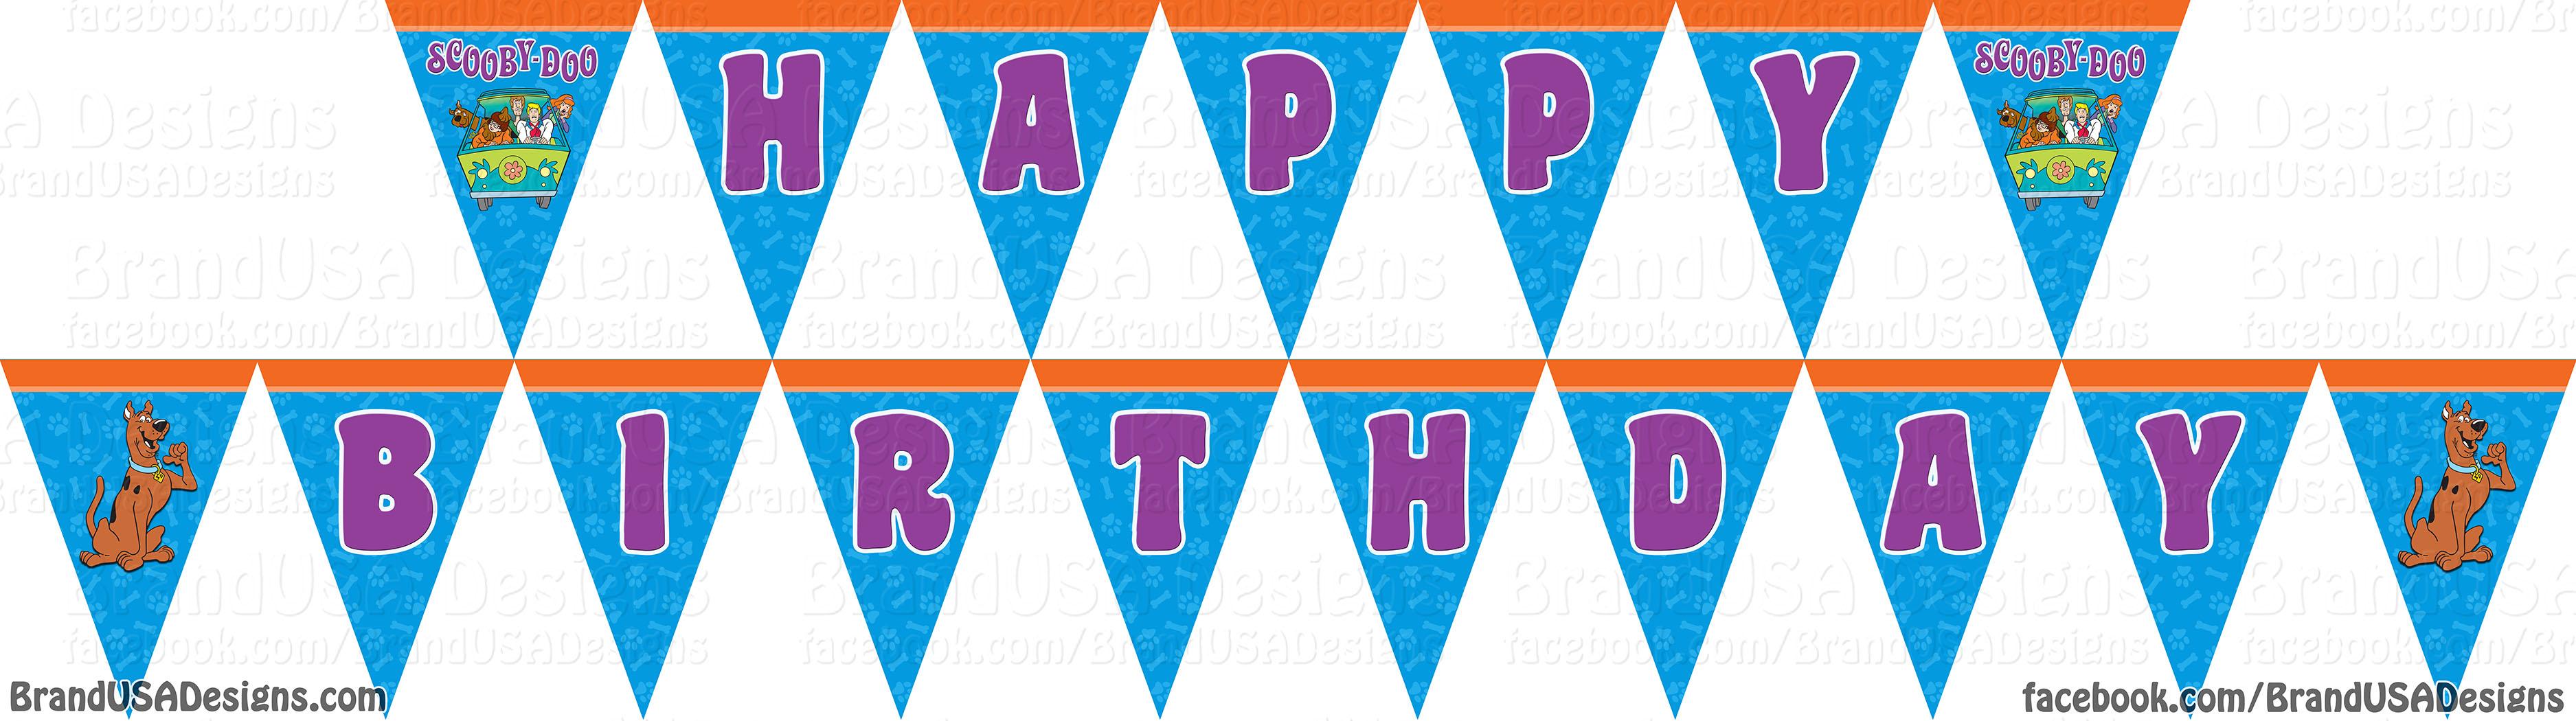 3750x1050 Birthday Clip Art Happy Birthday Banner ~ Frames ~ Illustrations